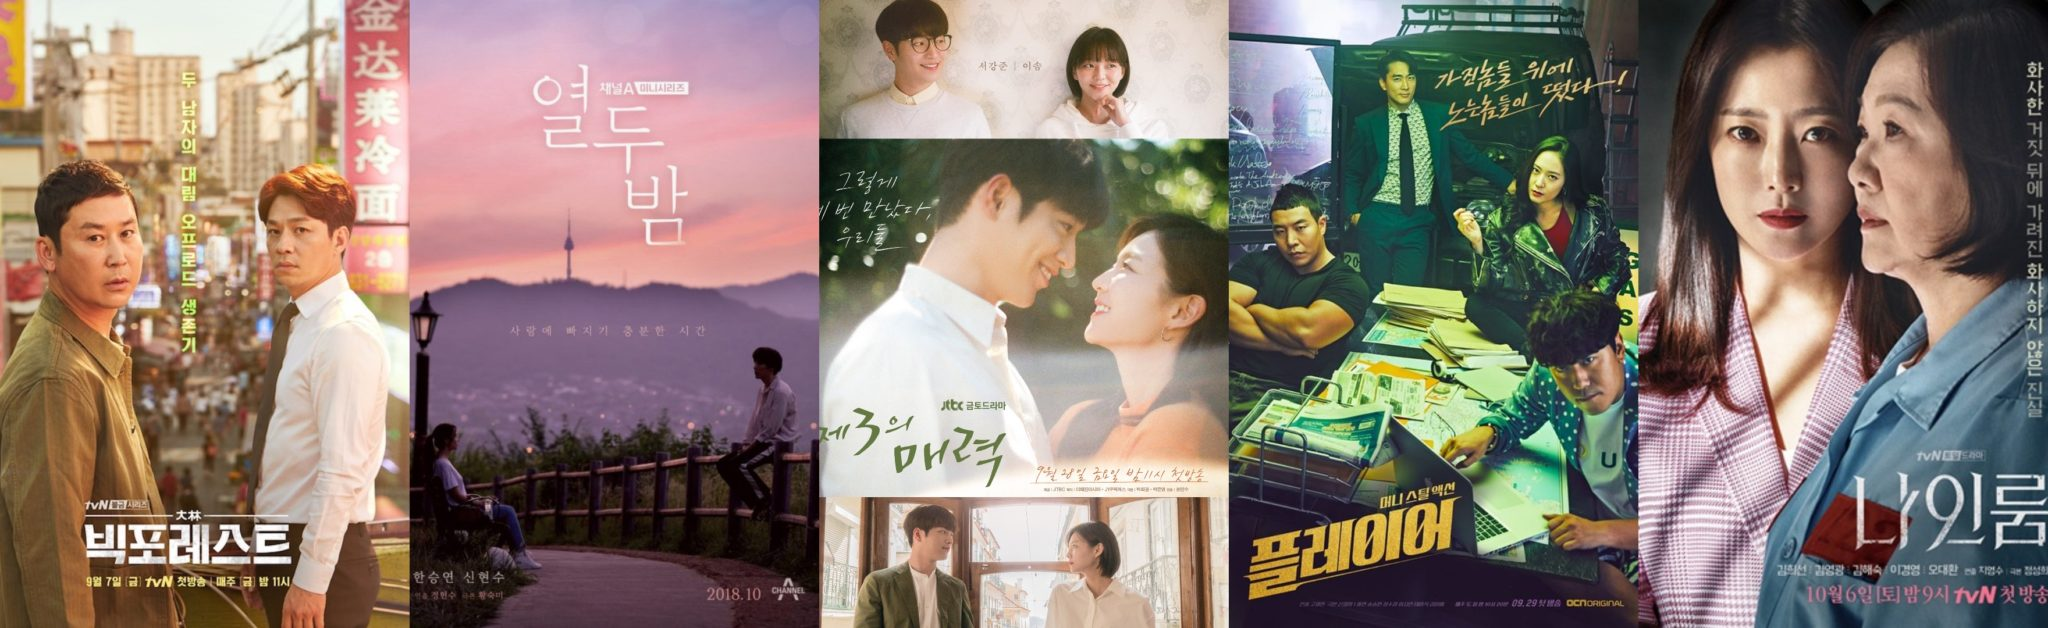 Where to Watch On Air Korean Dramas: October 15 - 21, 2018